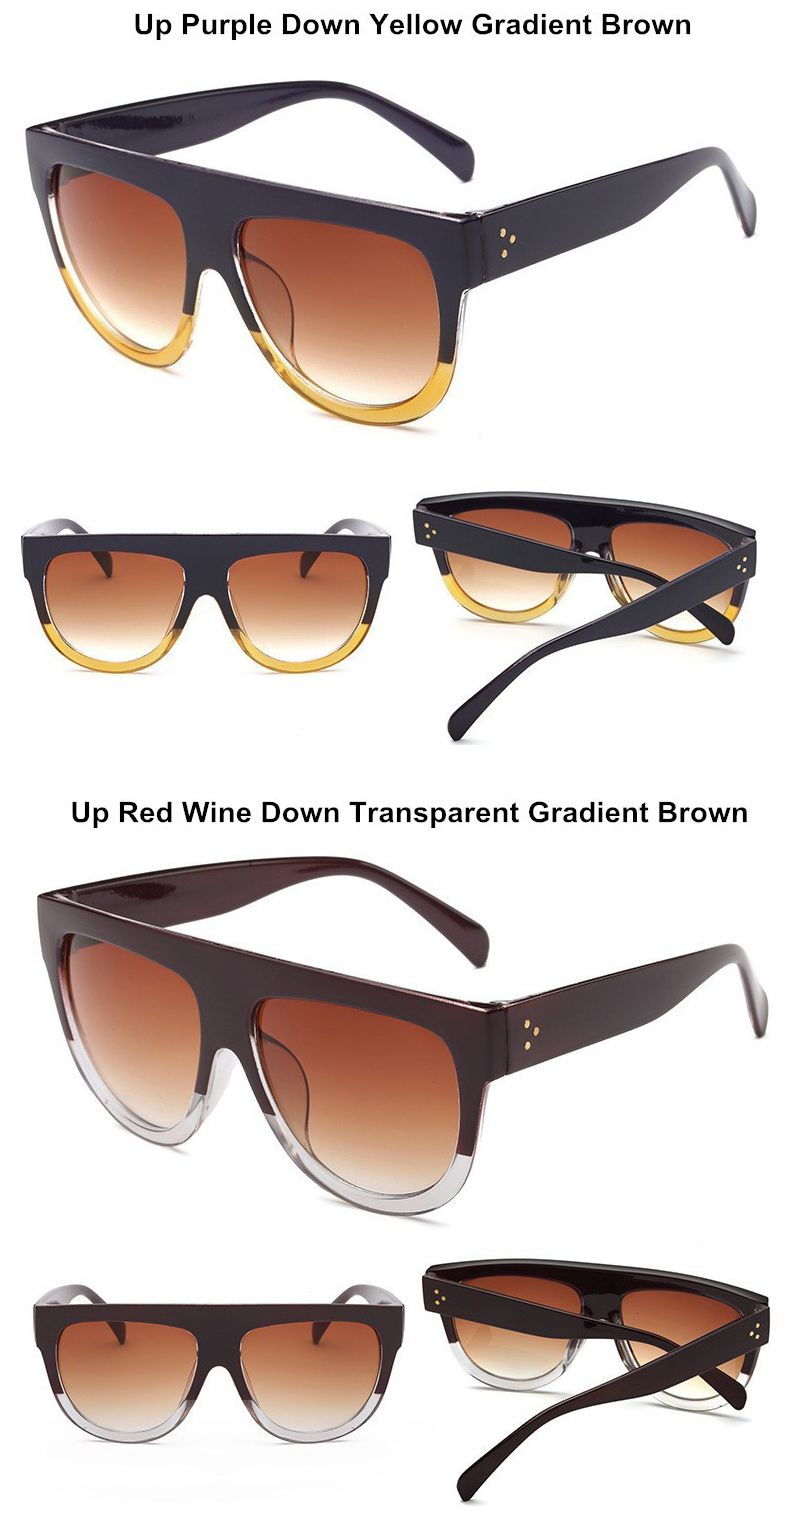 edcda8b7dd9 Italy Luxury Brand Designer Fashion Women Sunglasses Oversize Female Flat  Top Vintage Ladies Sun Glasses Men Eyewear